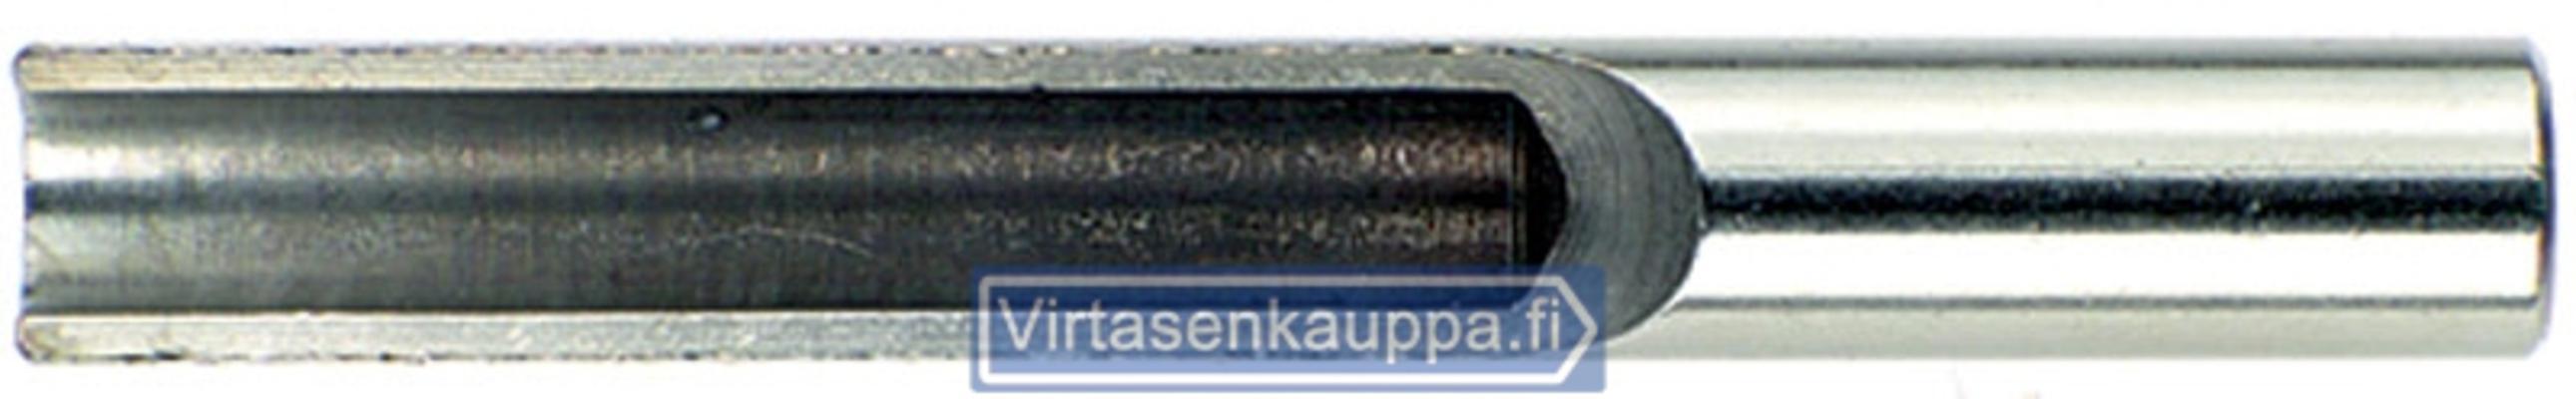 Kabelex® -asennushylsy 1523 (ABS), Stahlwille - Kabelex® -asennushylsy 1523 (ABS)